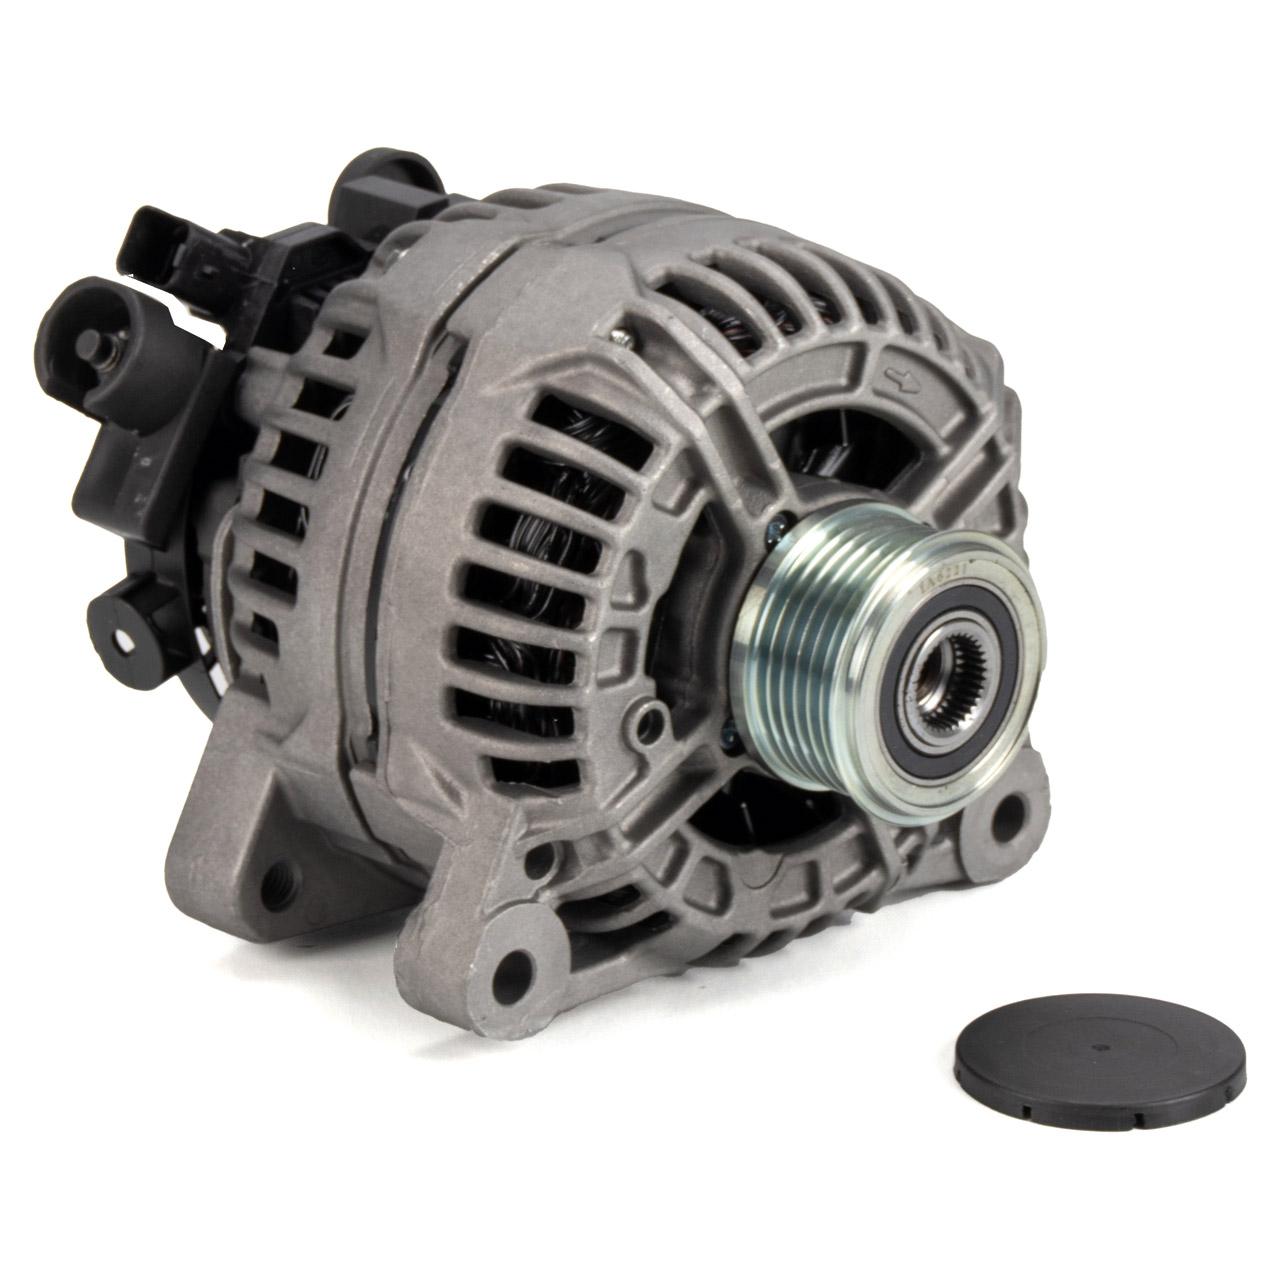 ORIGINAL Citroen Peugeot EUROREPAR Lichtmaschine Generator 12V 180A C3 C4 C5 1638095180